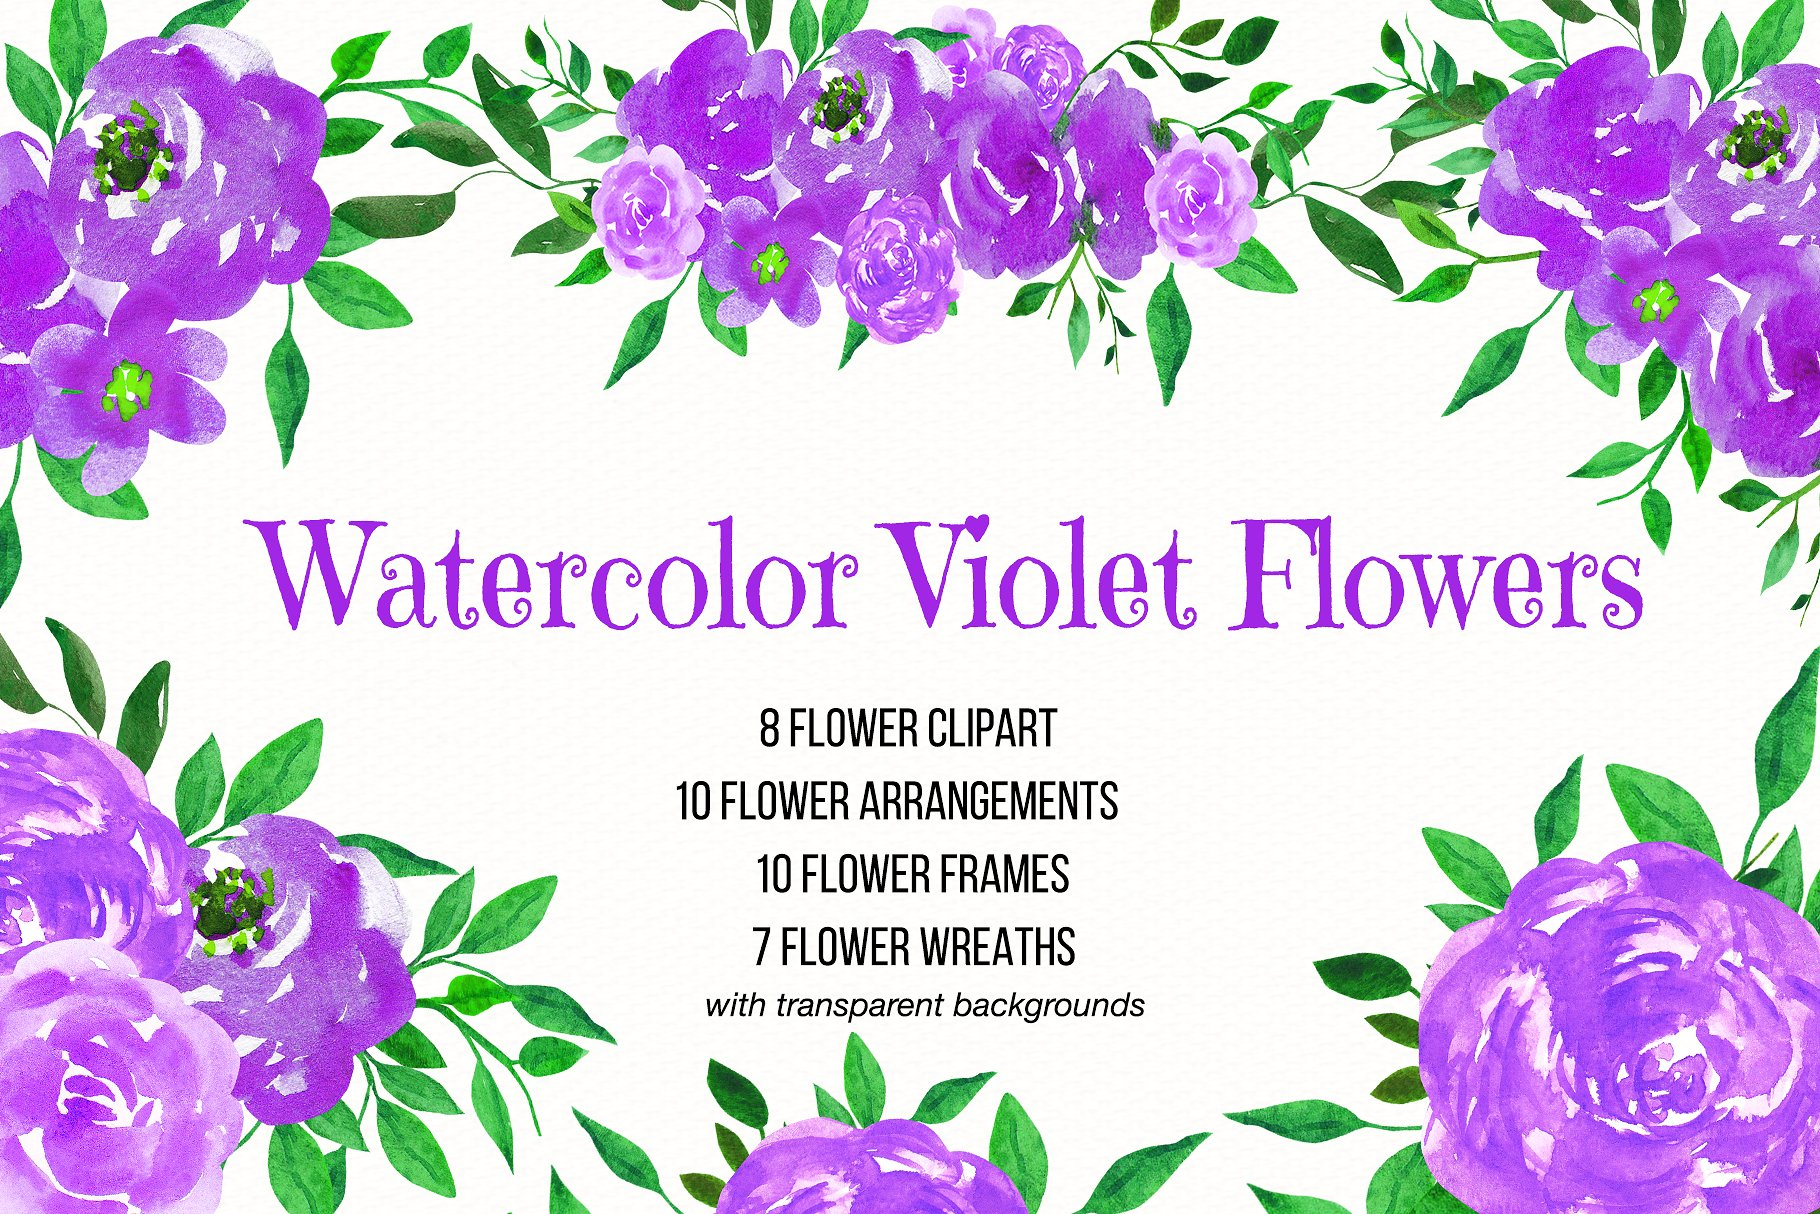 1820x1214 Watercolor Flower Clipart,flower Arrangements,flower Wreaths